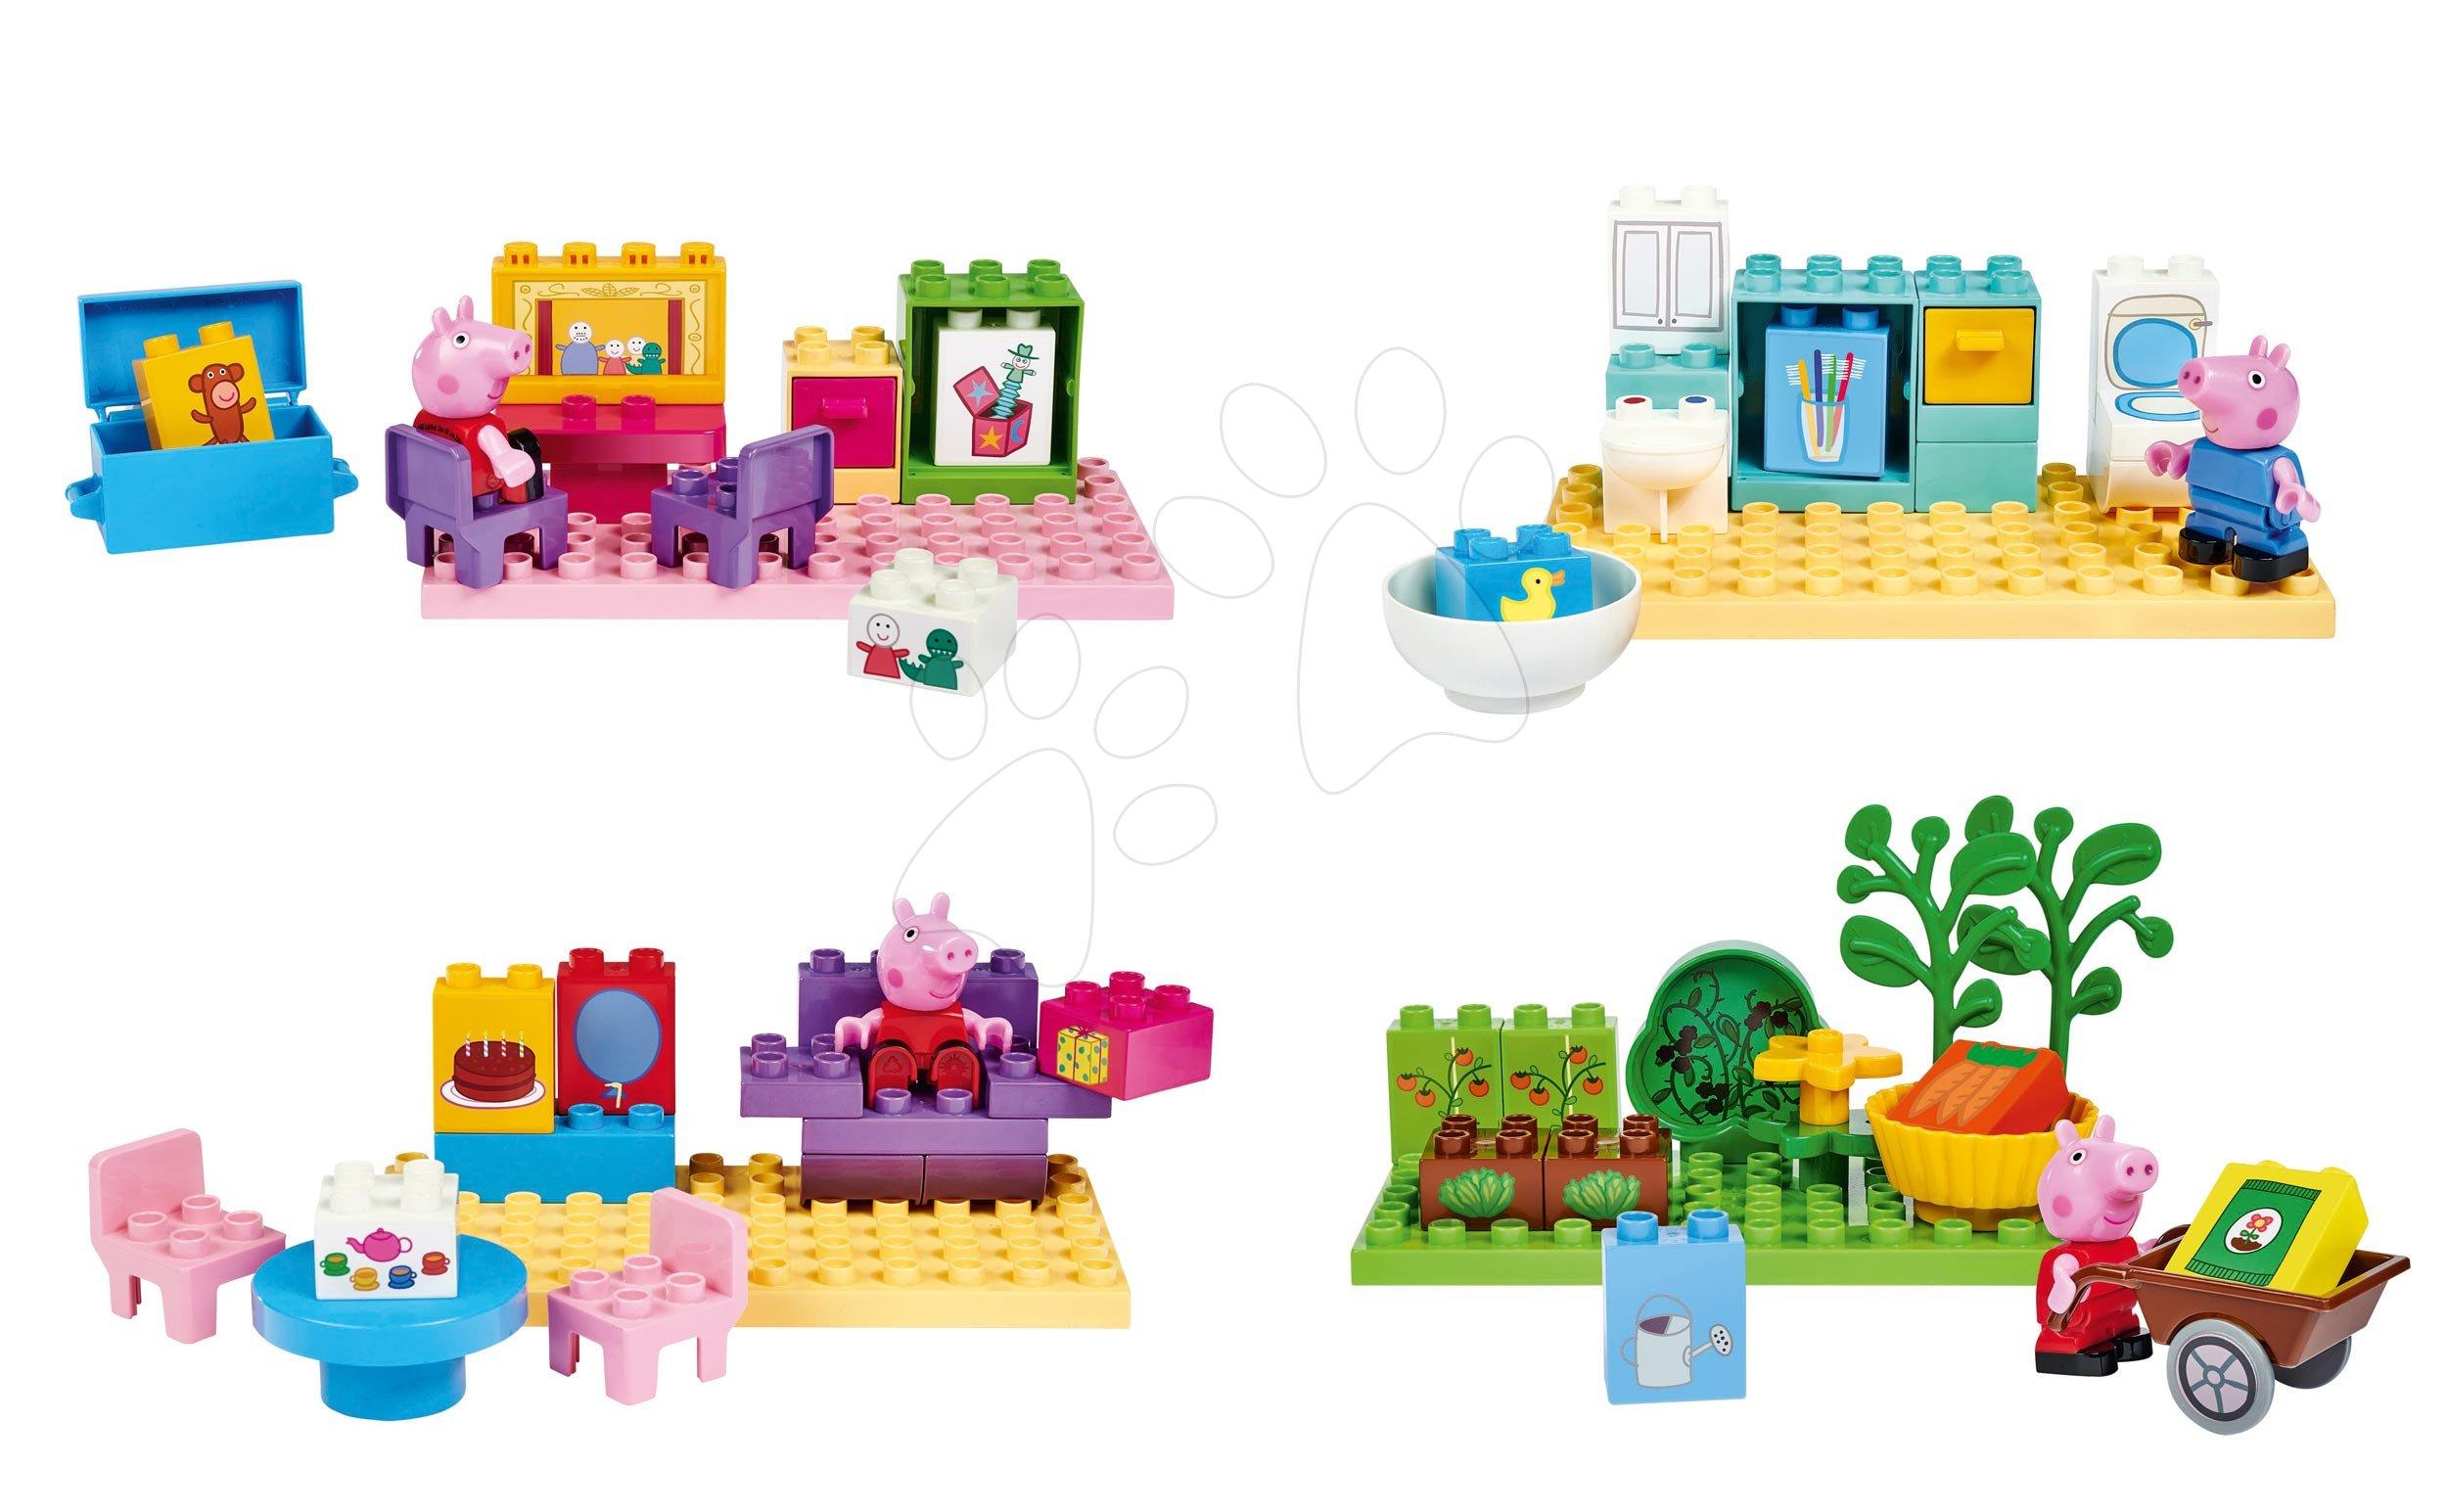 Stavebnica Peppa Pig Basic Sets II. PlayBIG Bloxx s figúrkou - sada 4 druhov od 18 mes